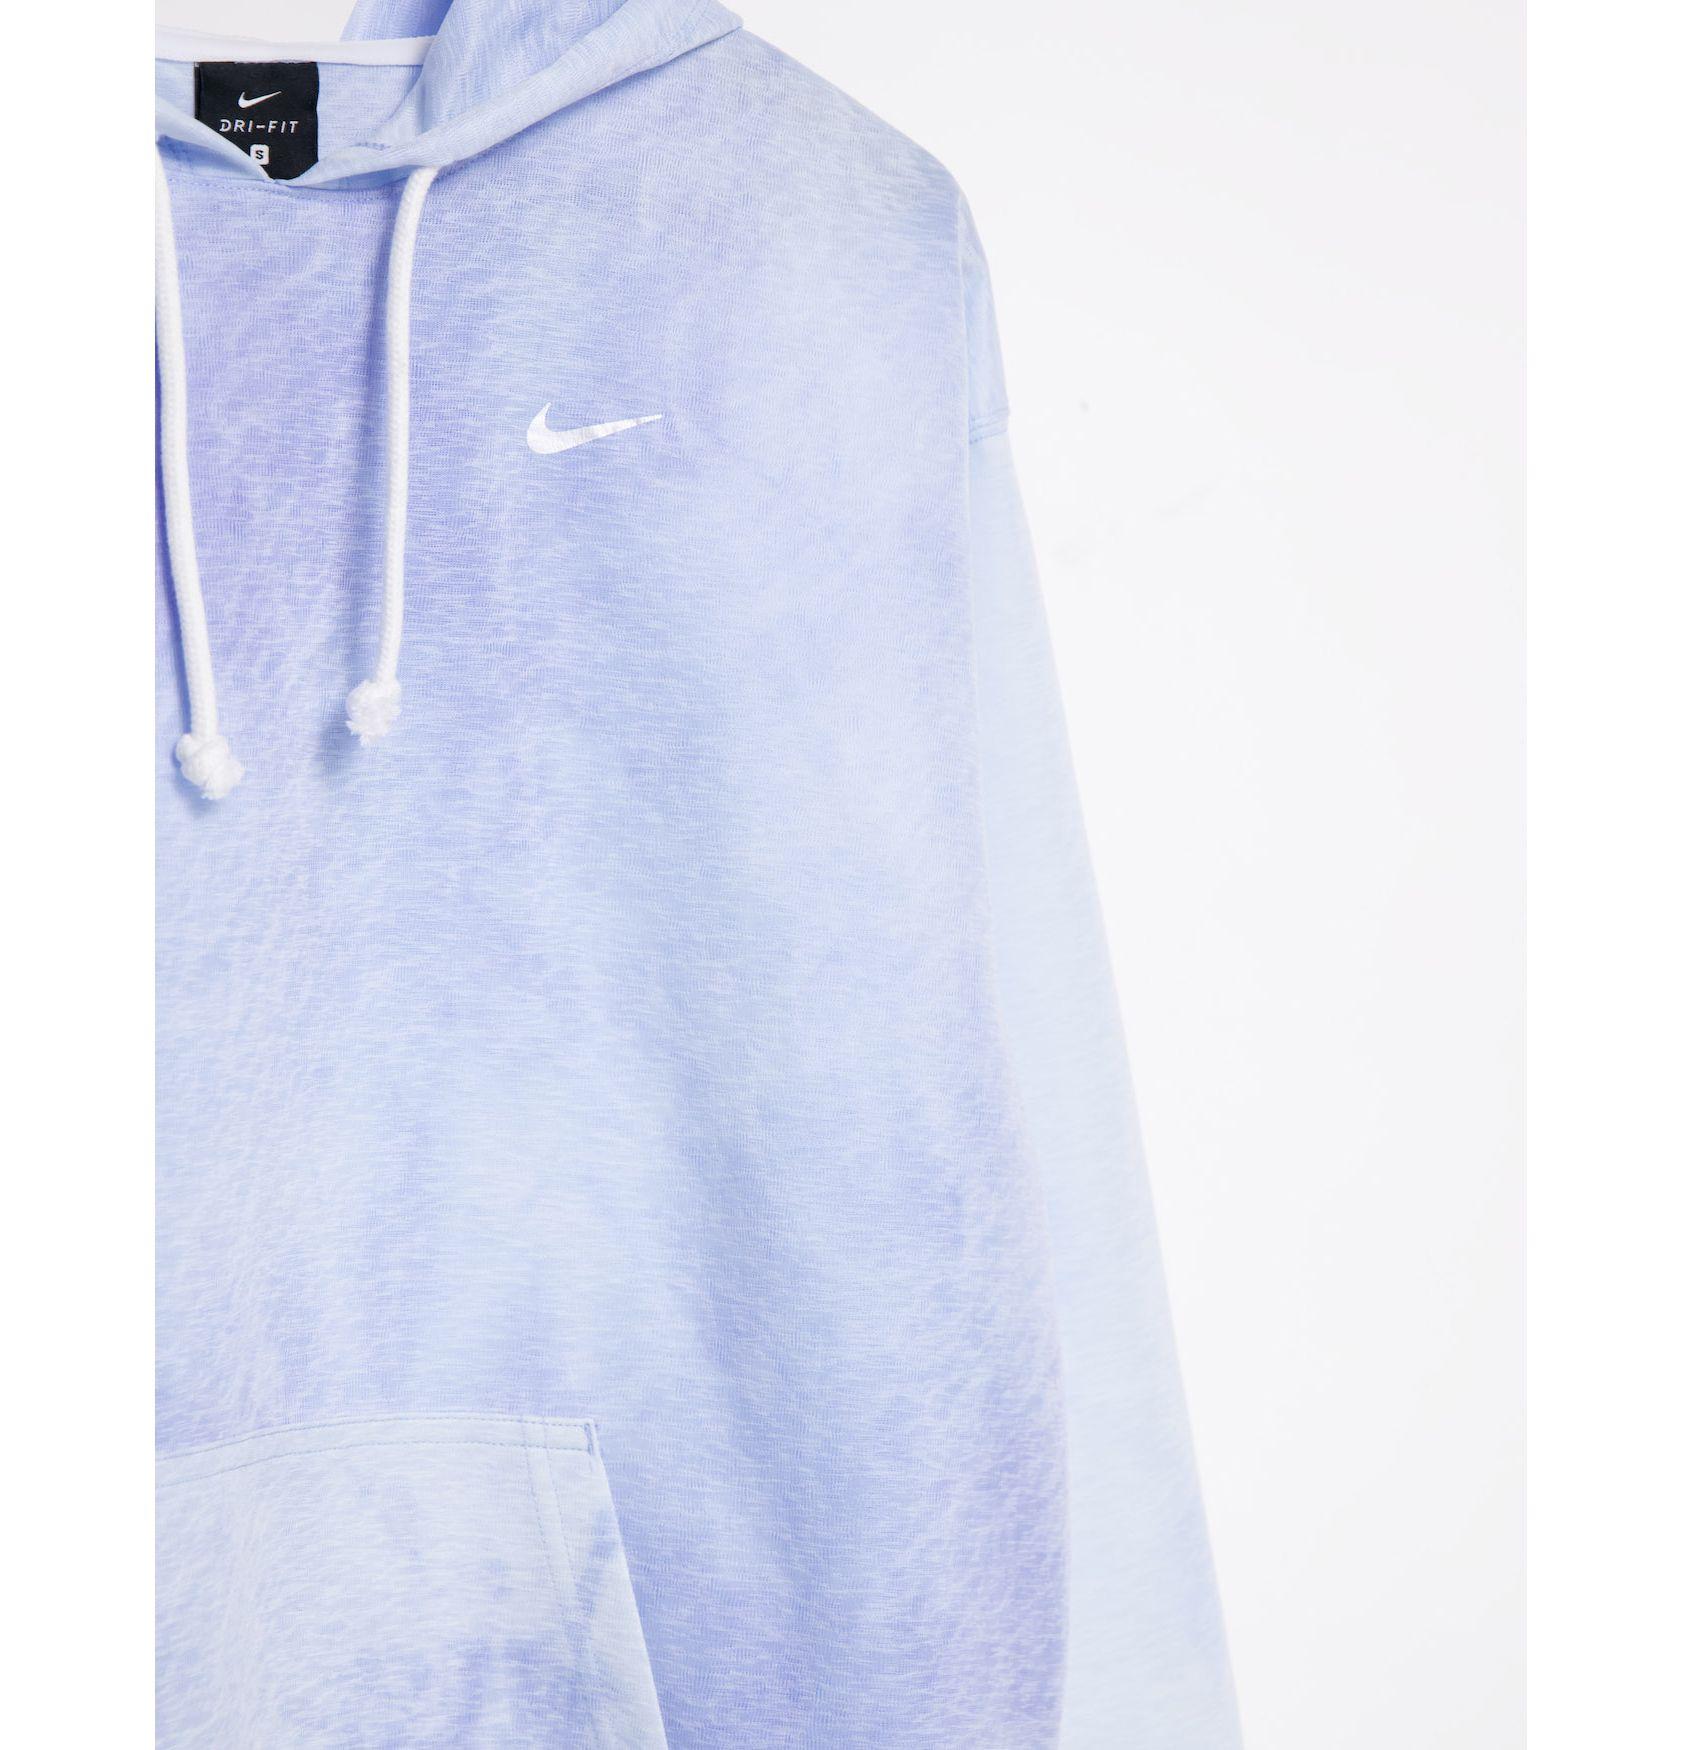 Nike Training Icon Clash tie dye hoodie in blue -  Price Checker